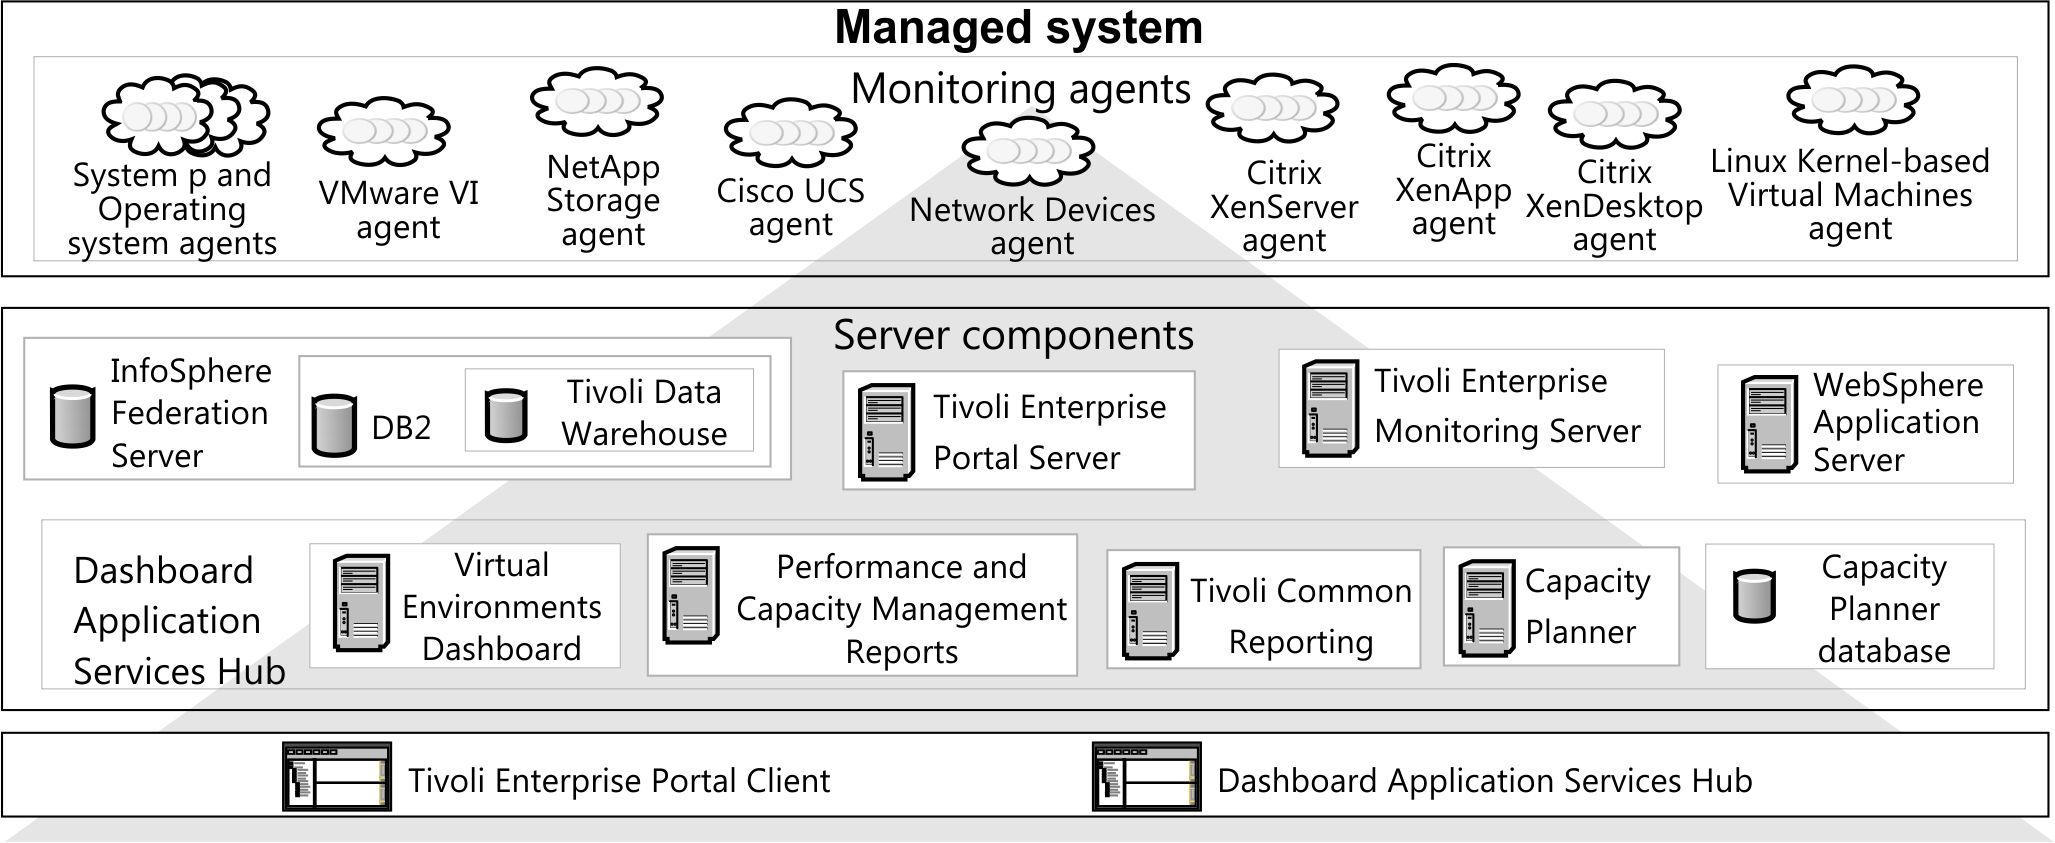 IBM Tivoli Monitoring for Virtual Environments